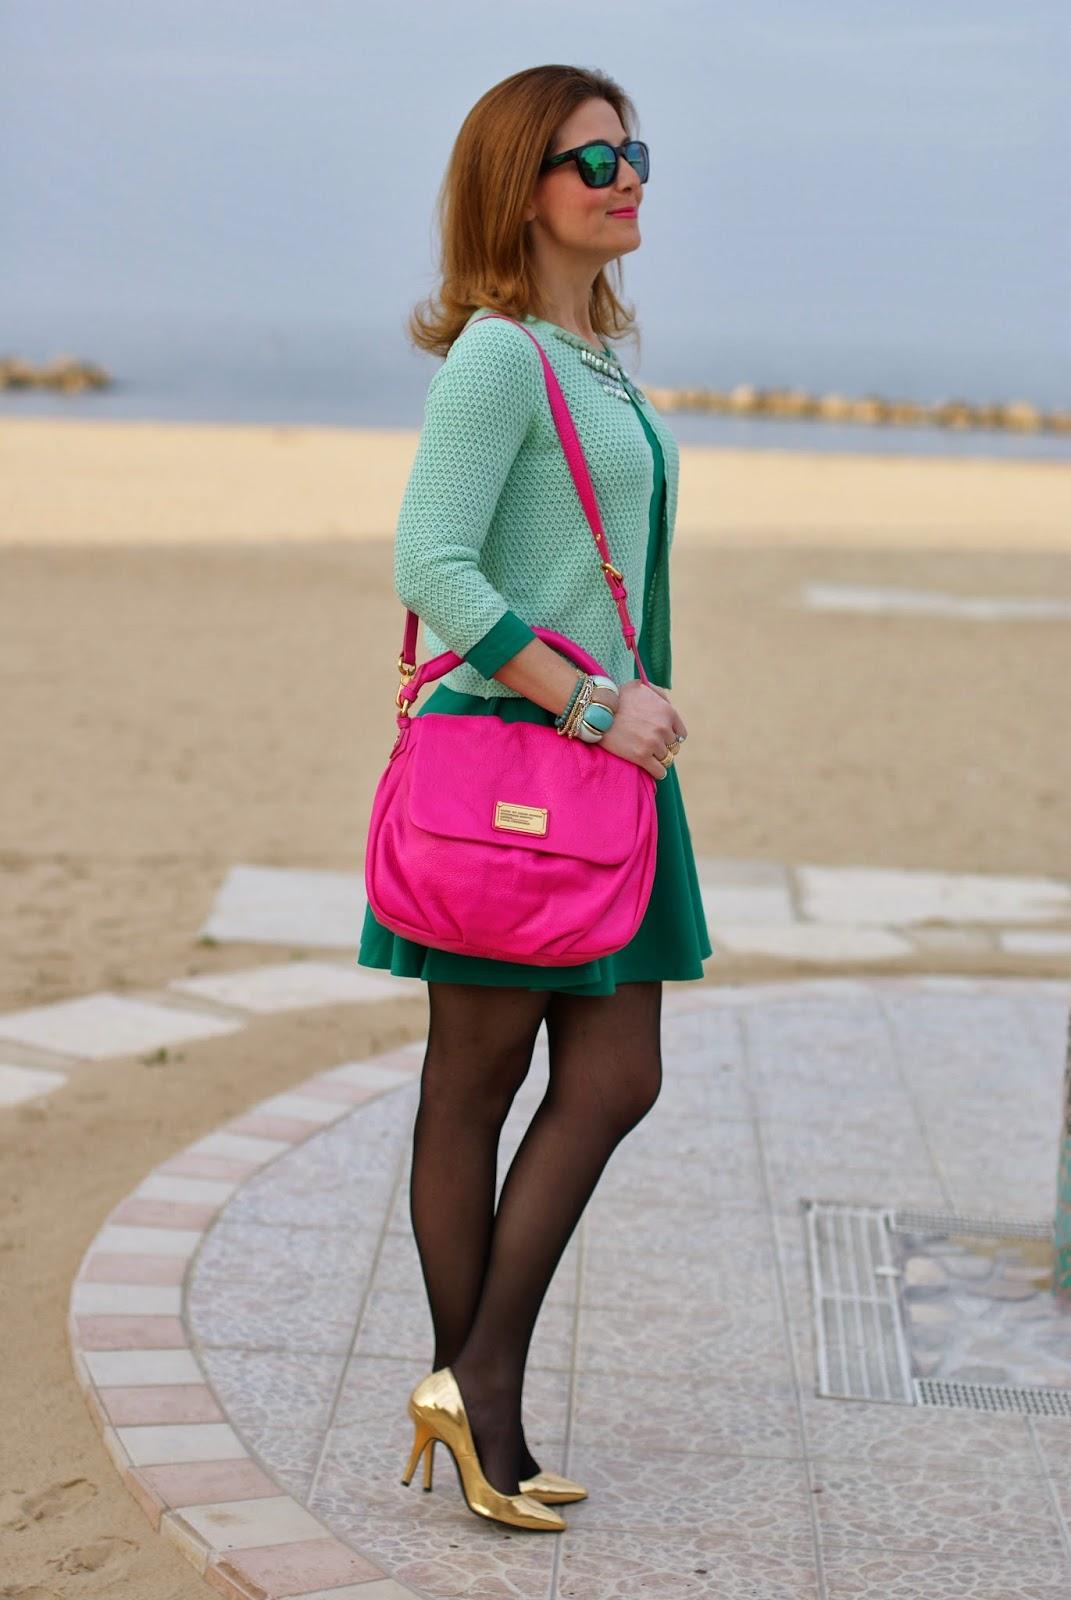 Jeweled cardigan, Marc by Marc Jacobs lil ukita bag, Giorgia and Johns, Fashion and Cookies, fashion blogger